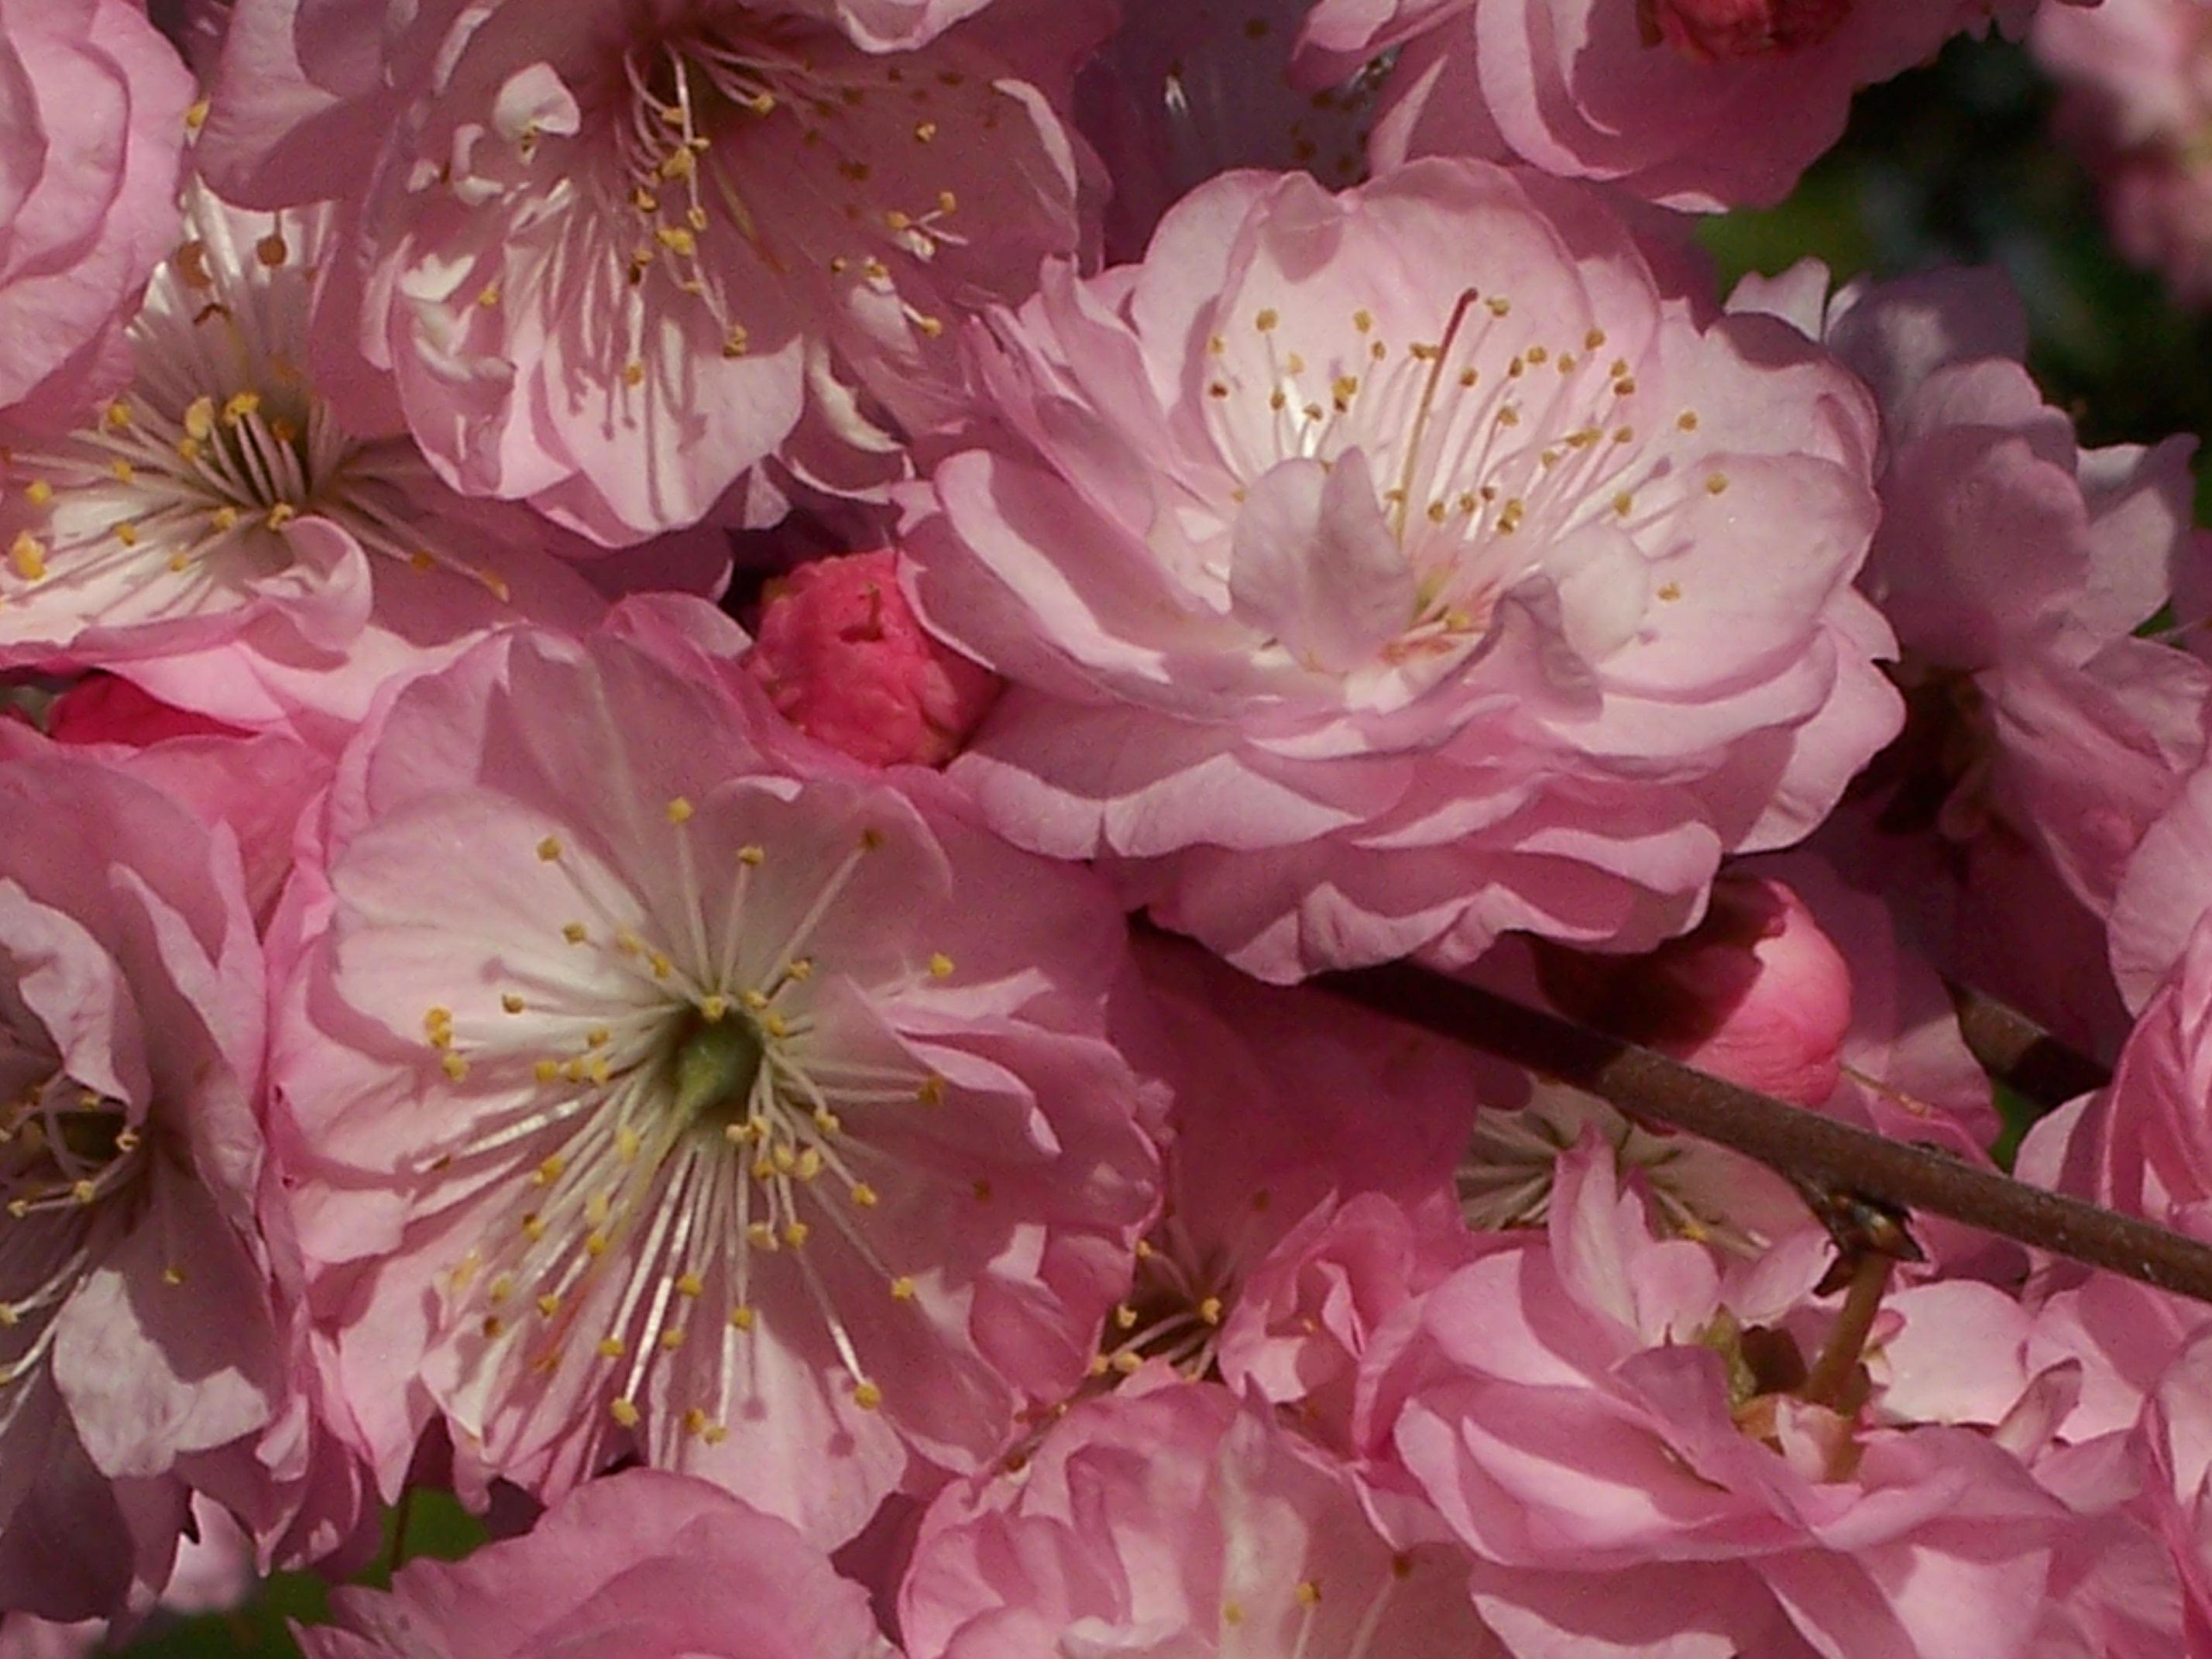 Flowering Almond Flowers by allatar on DeviantArt